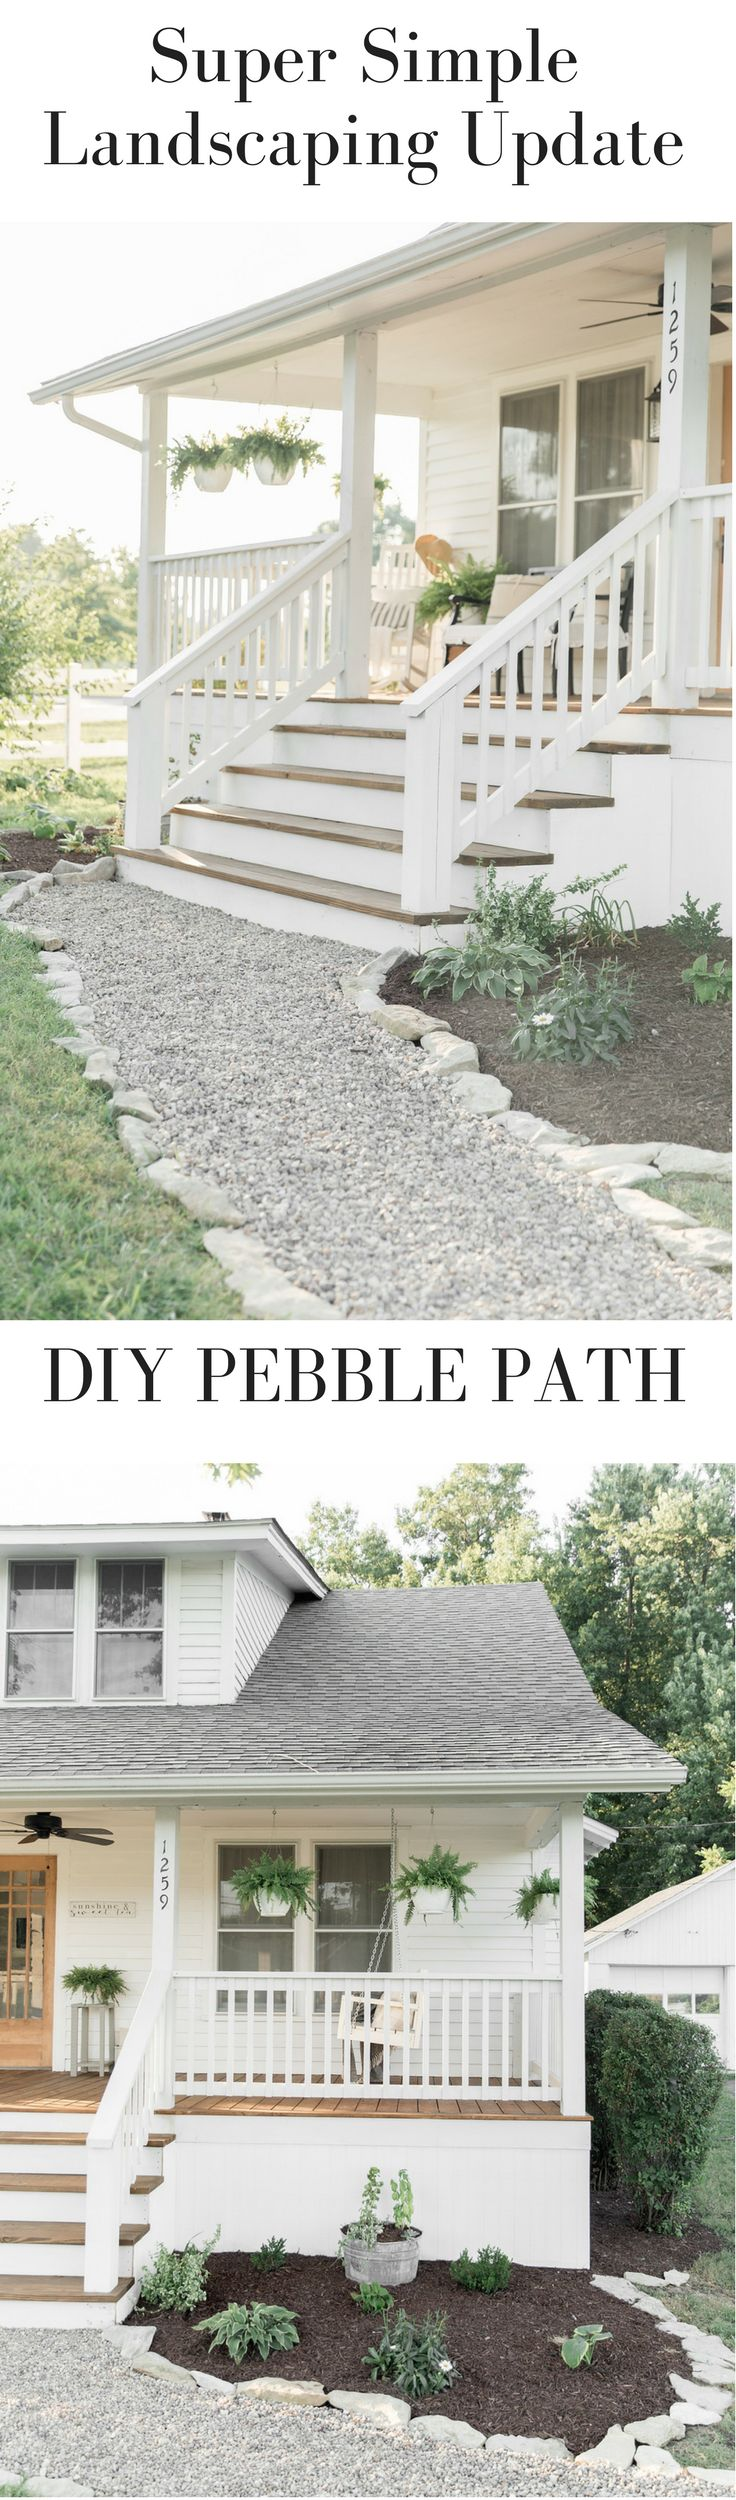 Simple landscaping ideas farmhouse style DIY gravel path